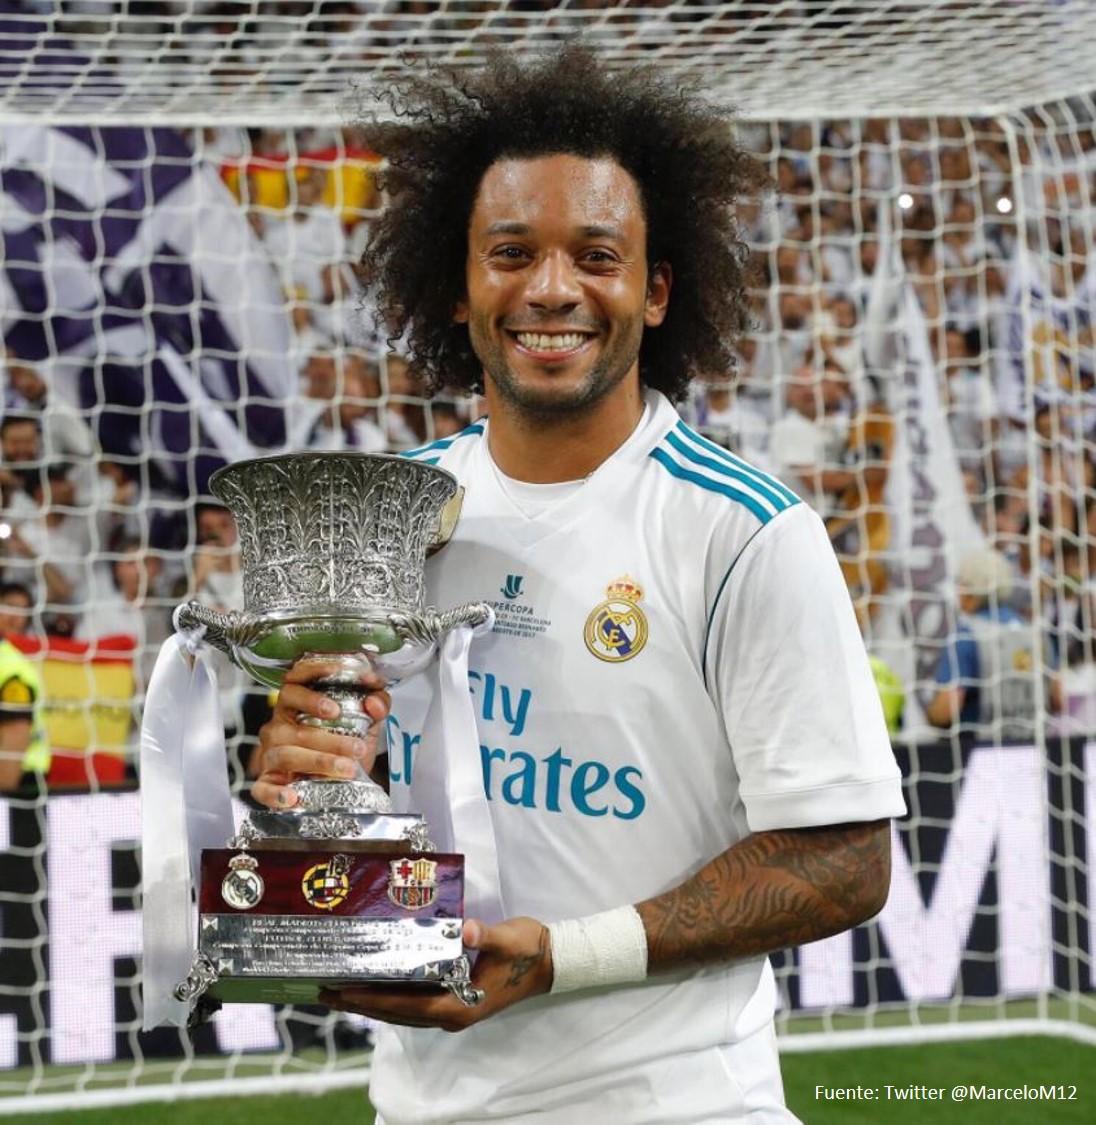 Marcelo Supercopa